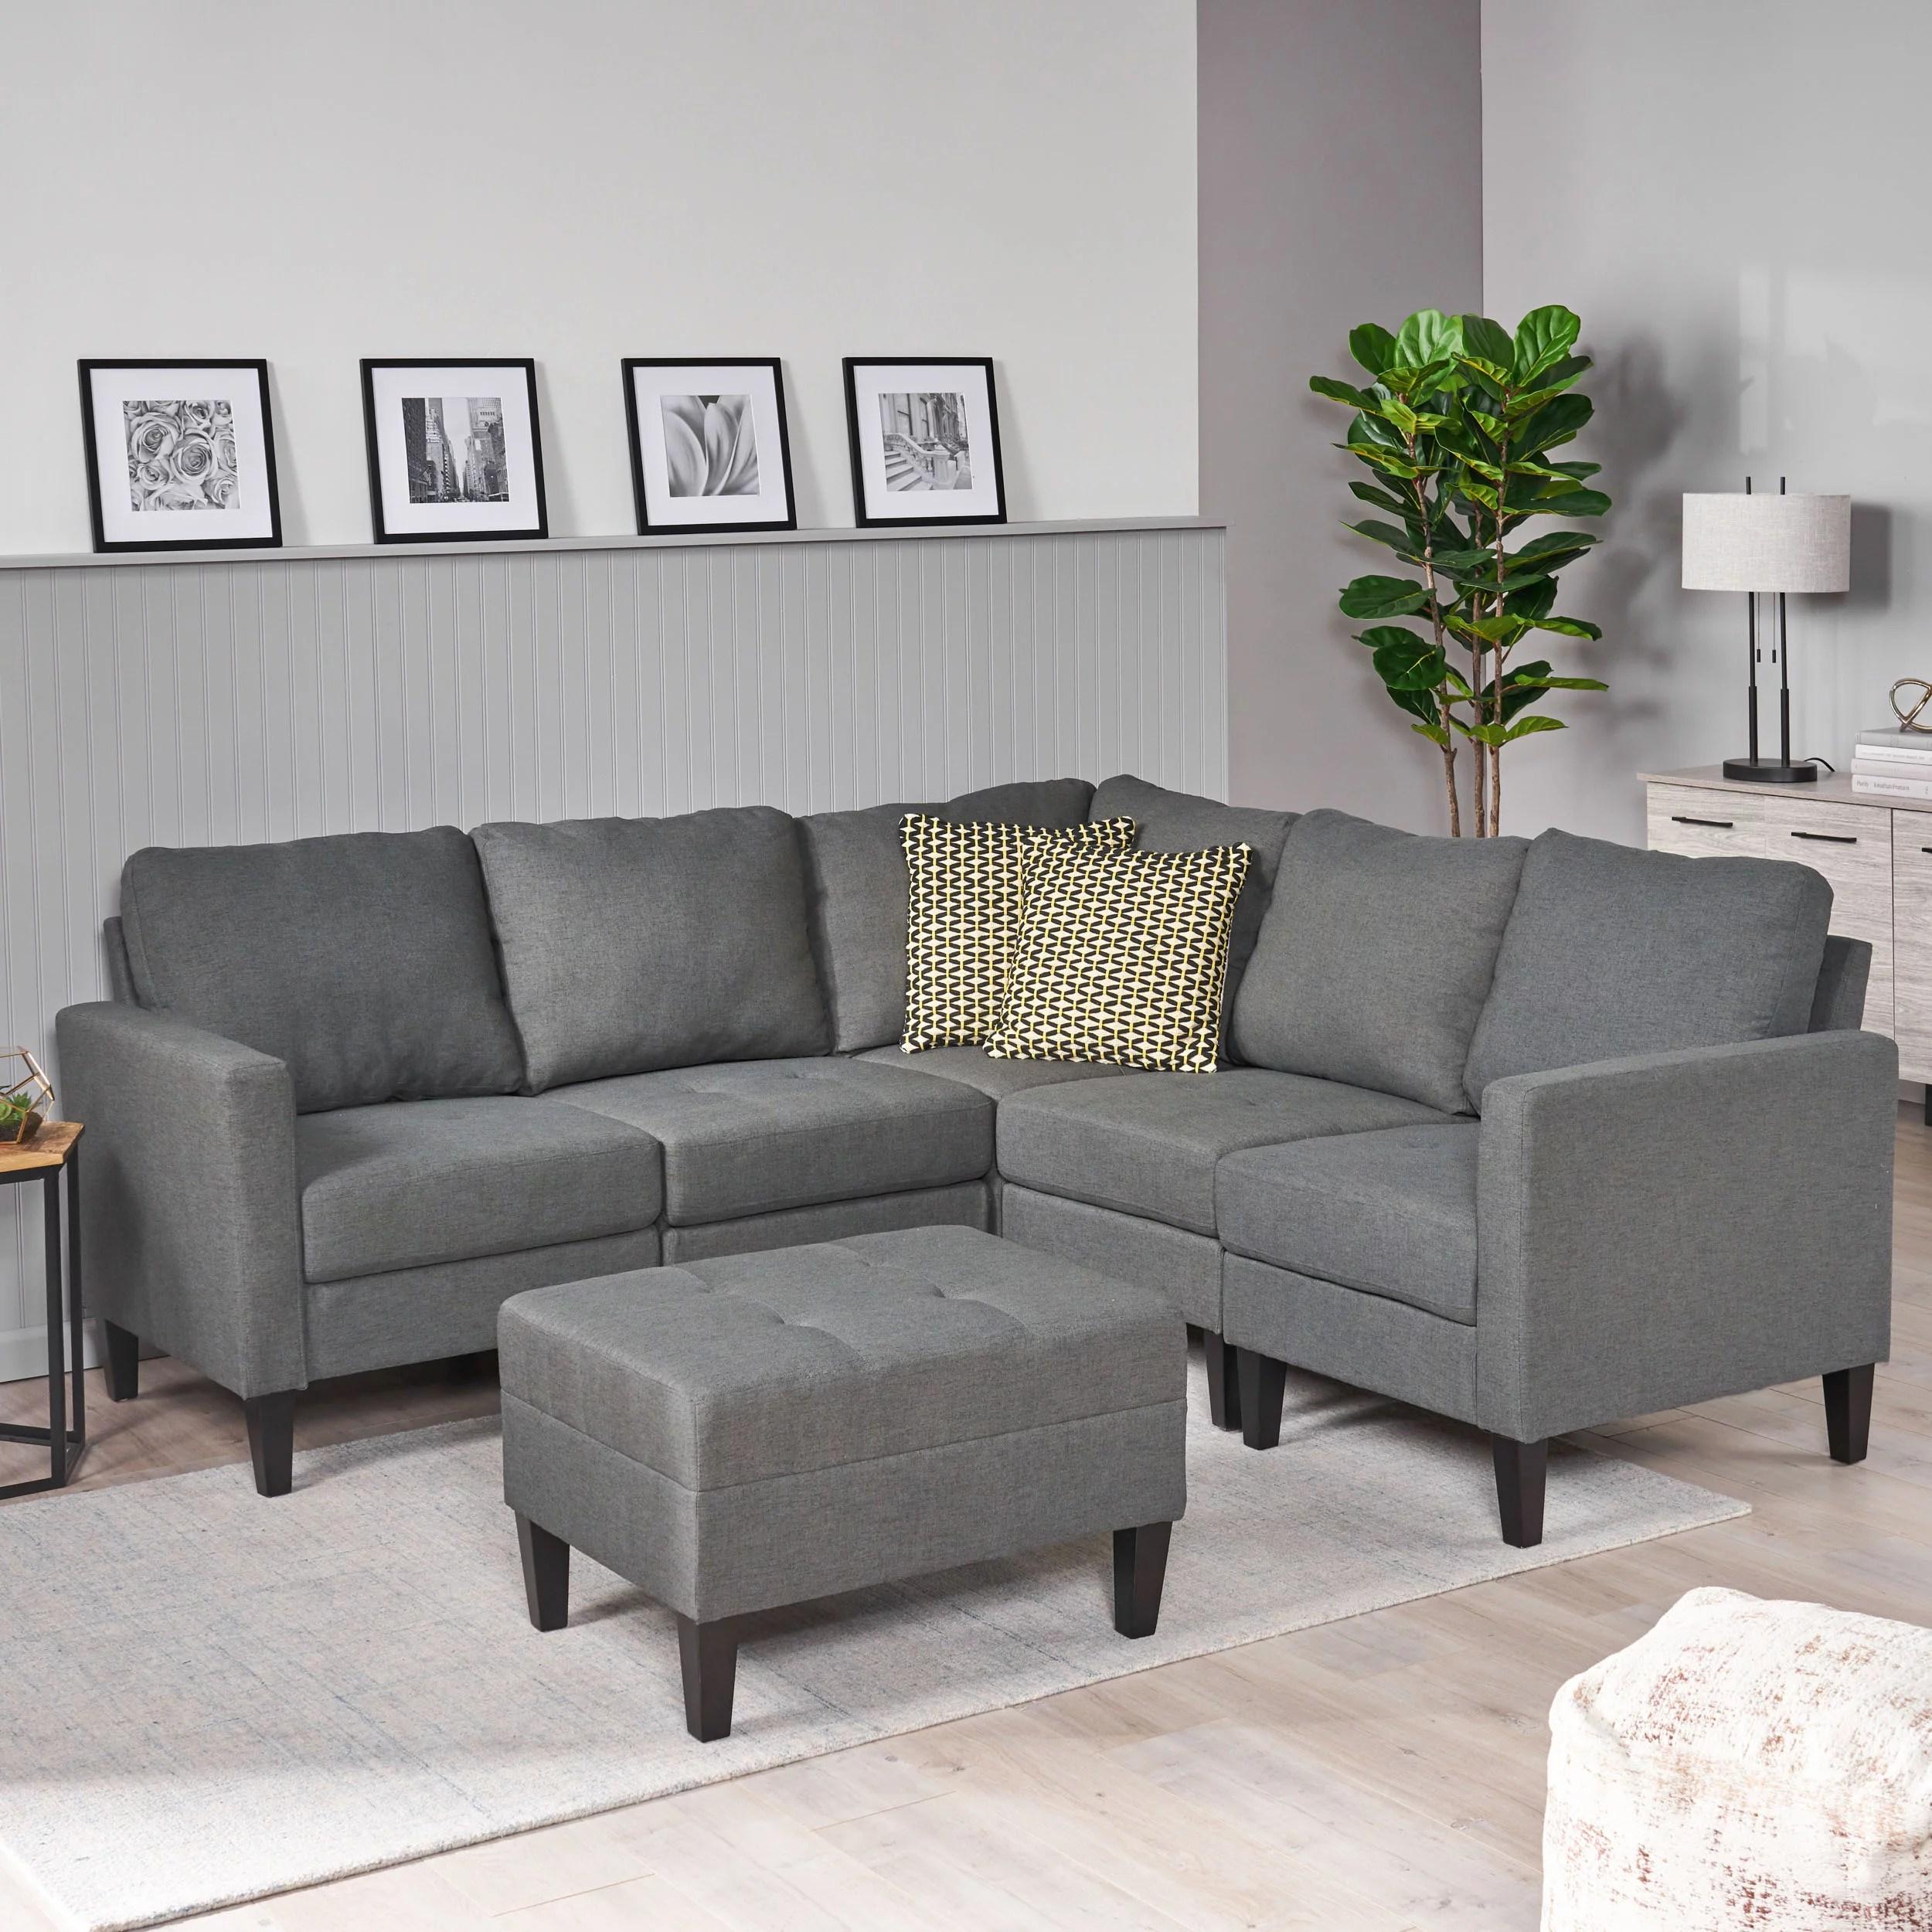 modernluxe symmetrical sectional sofa with ottoman